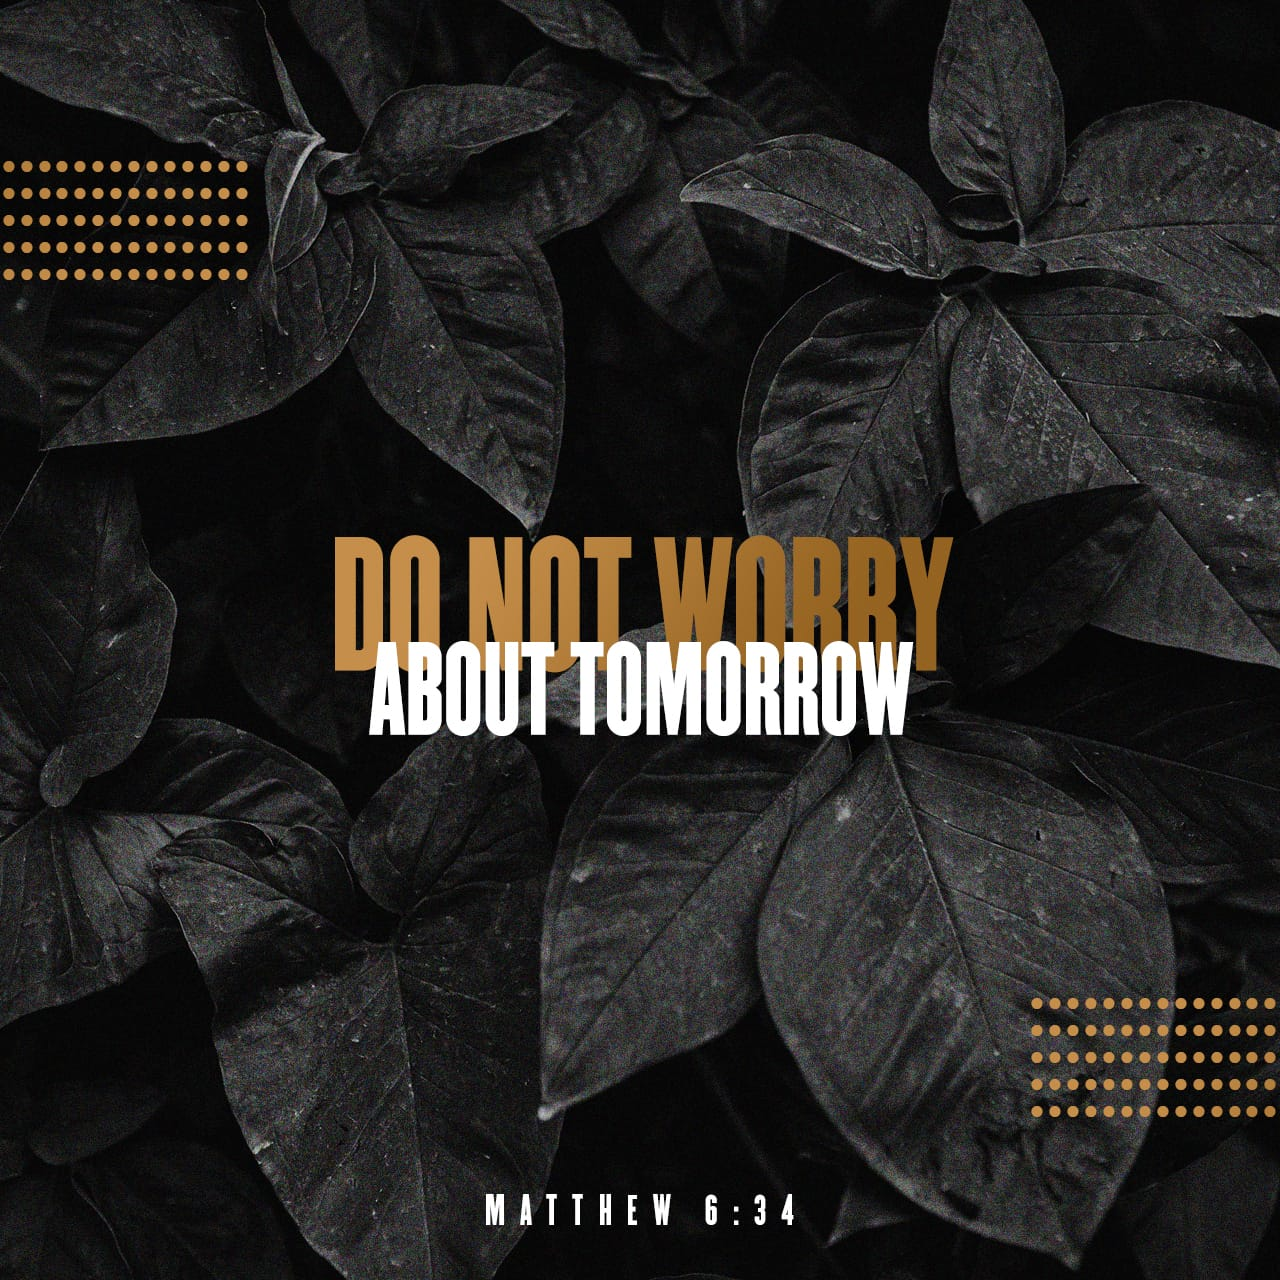 Matthew 6:34 ESV